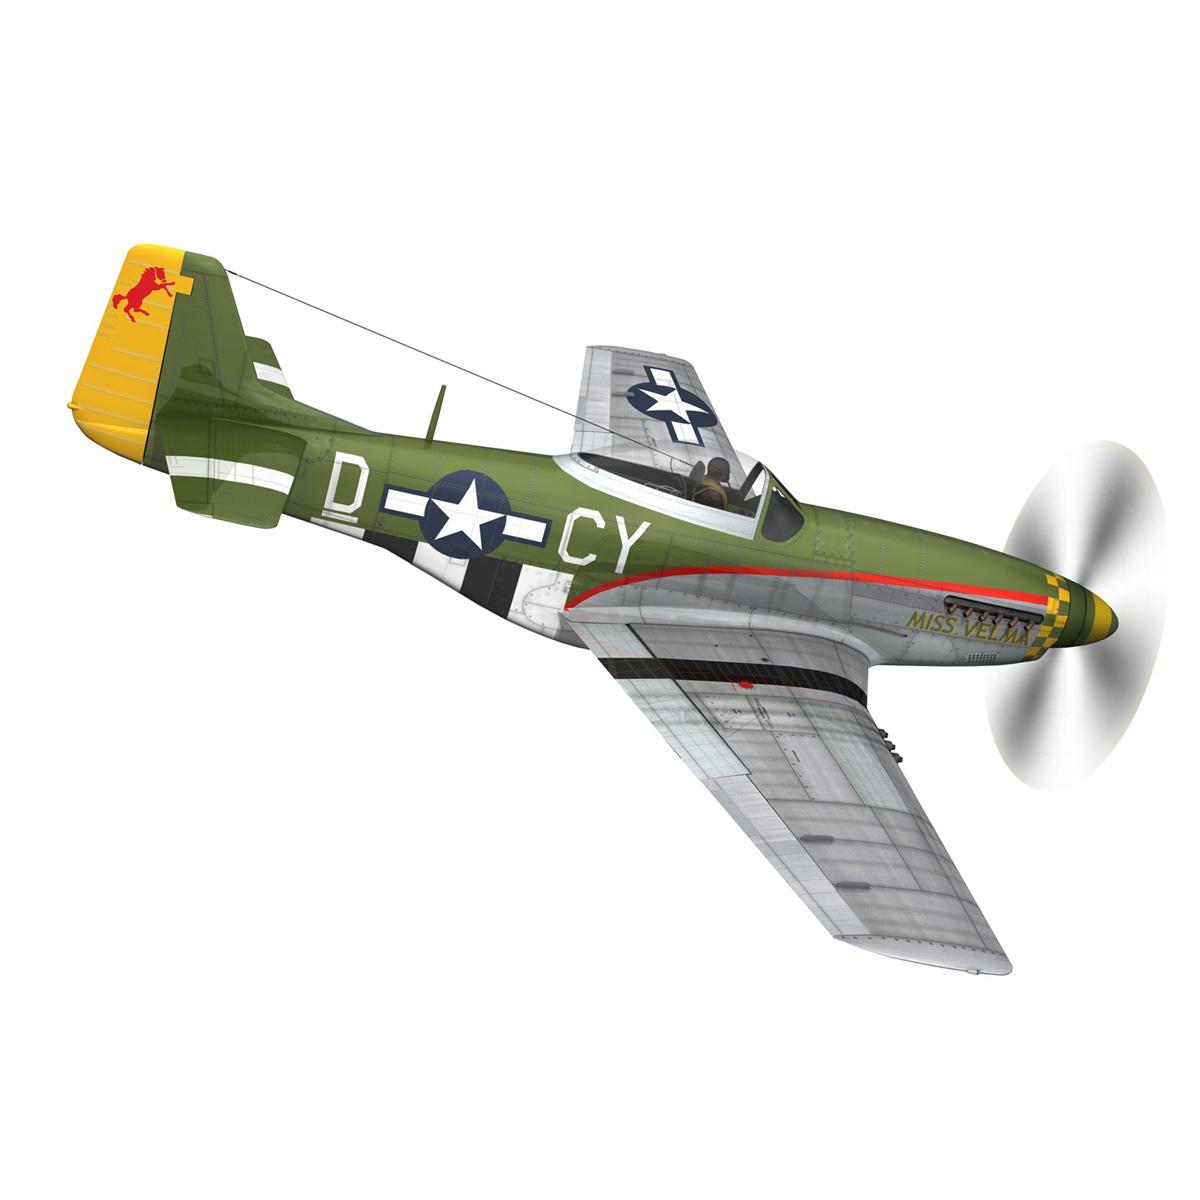 north american p-51d – mustang – miss velma 3d model 3ds fbx c4d lwo obj 267622